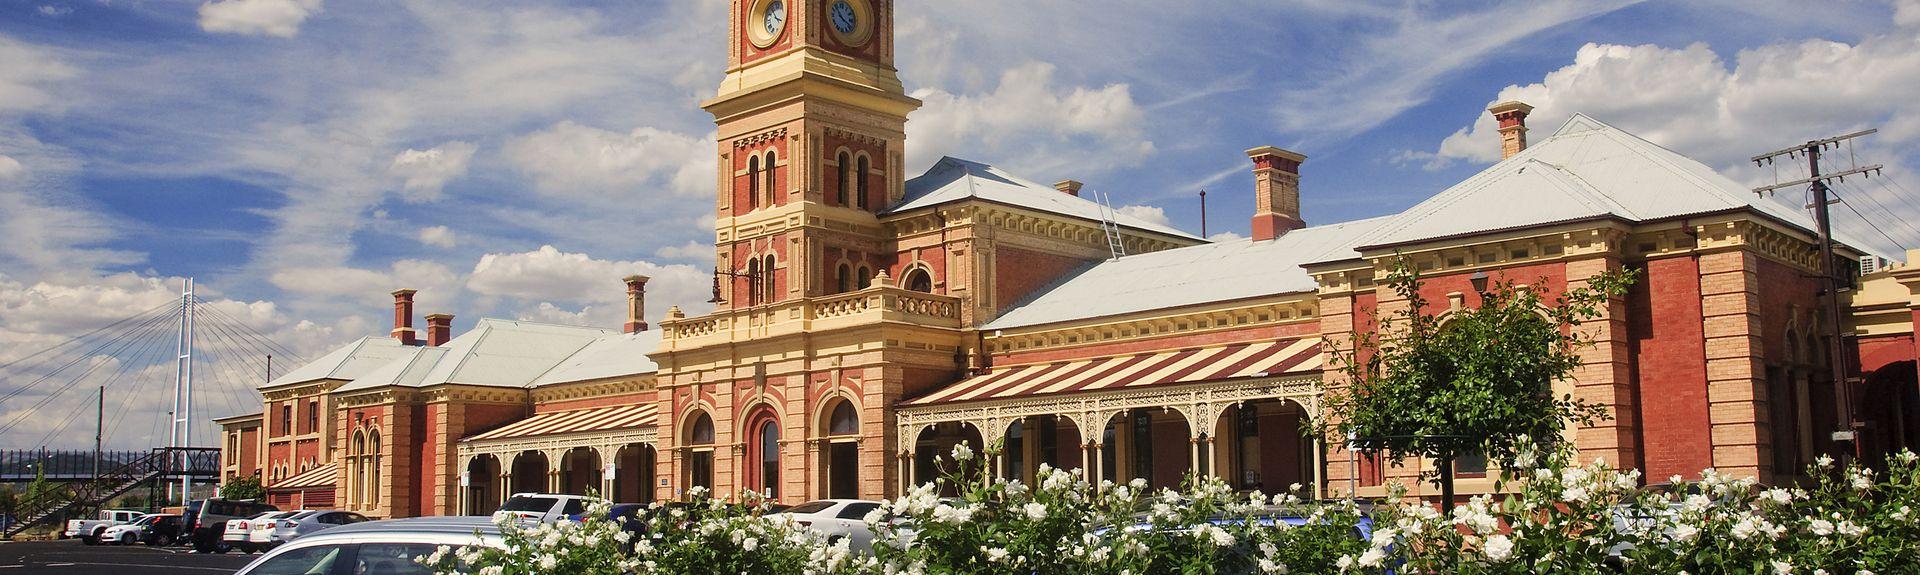 Albury, New South Wales, Australia